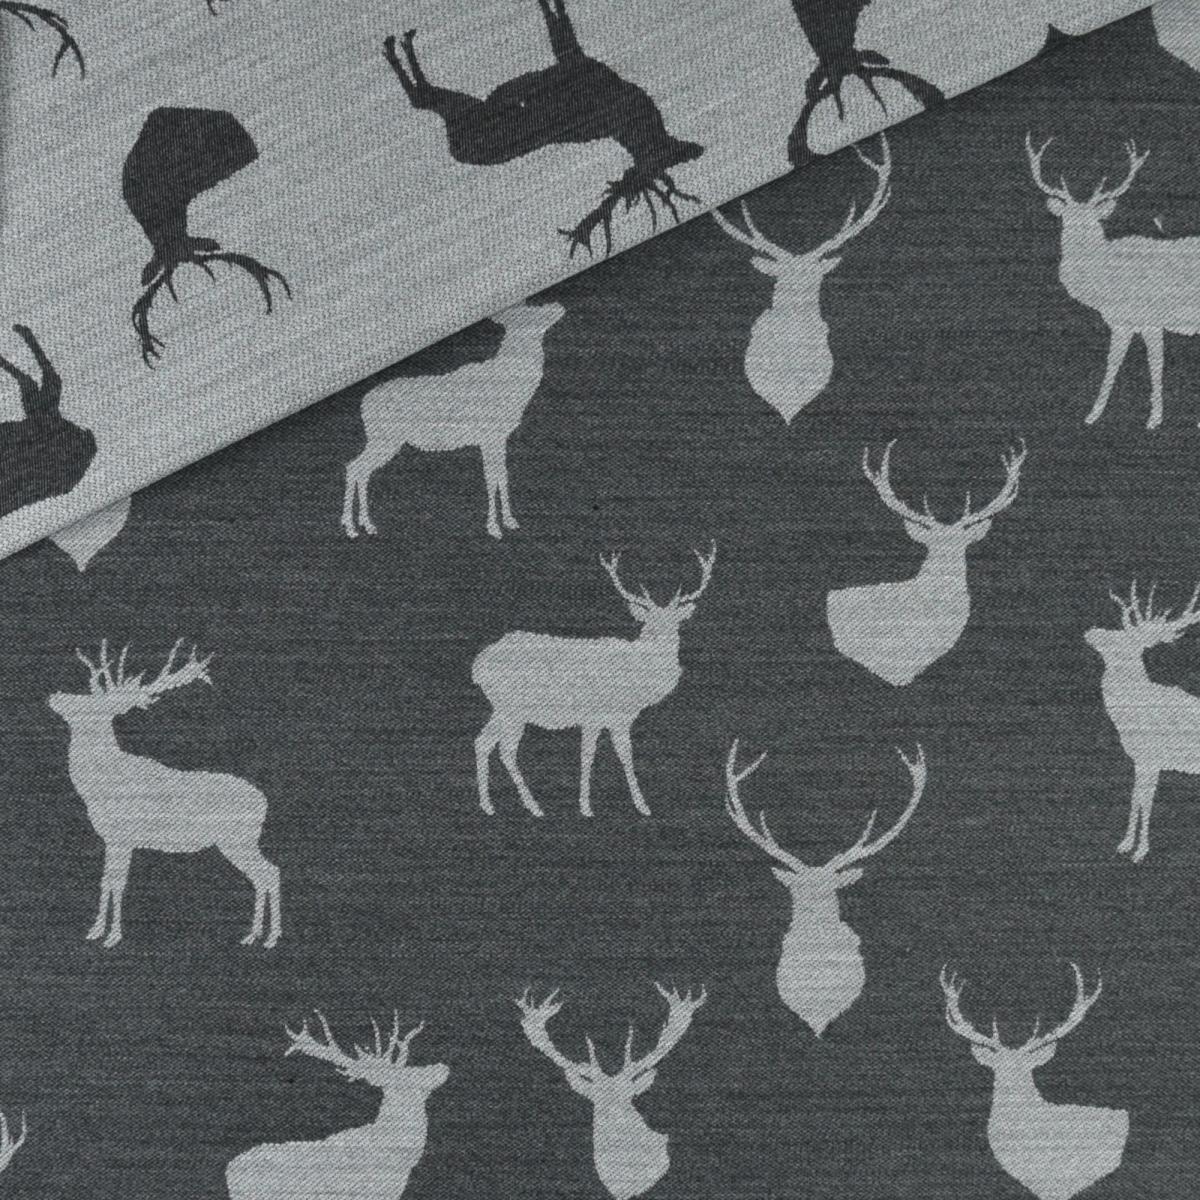 Jacquardstoff mit Hirschmotiven